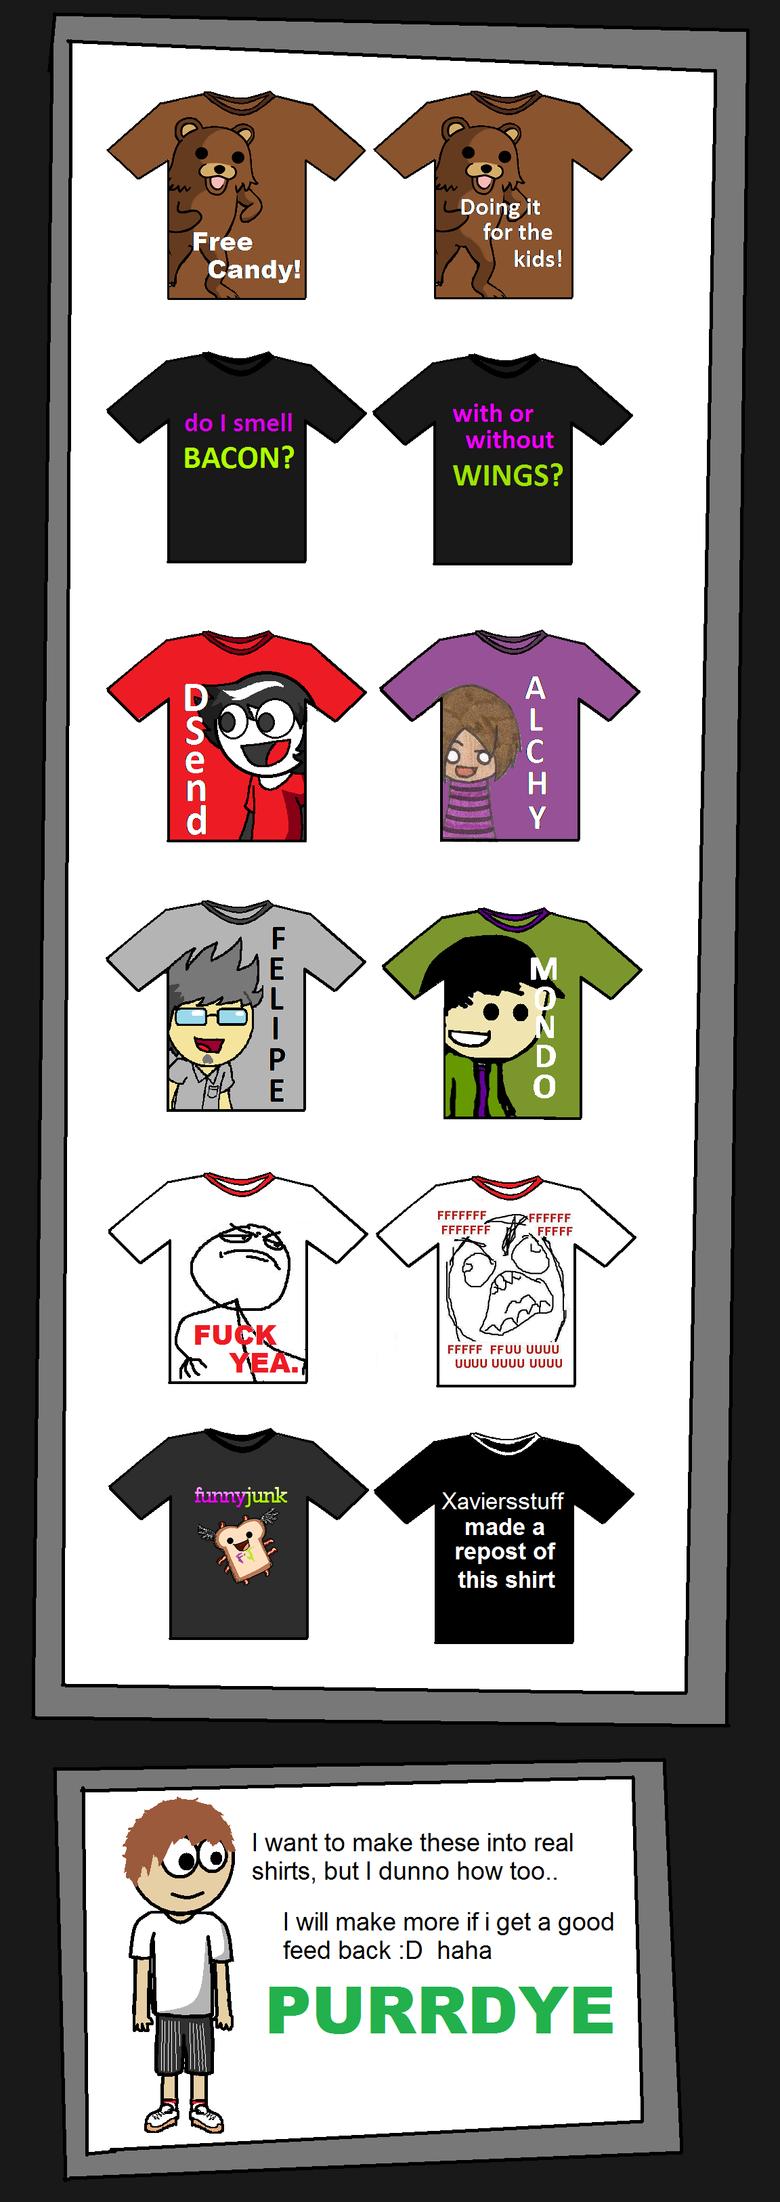 Shirt Designs. Part 2 funnyjunk.com/funny_pictures/448760/MOAR+Shirt+Designs/Does anyone know a way to get these made in r/l?. FFUU uguu uguu uguu Xaviersstuff  shirts designs Bacon is orgasmic